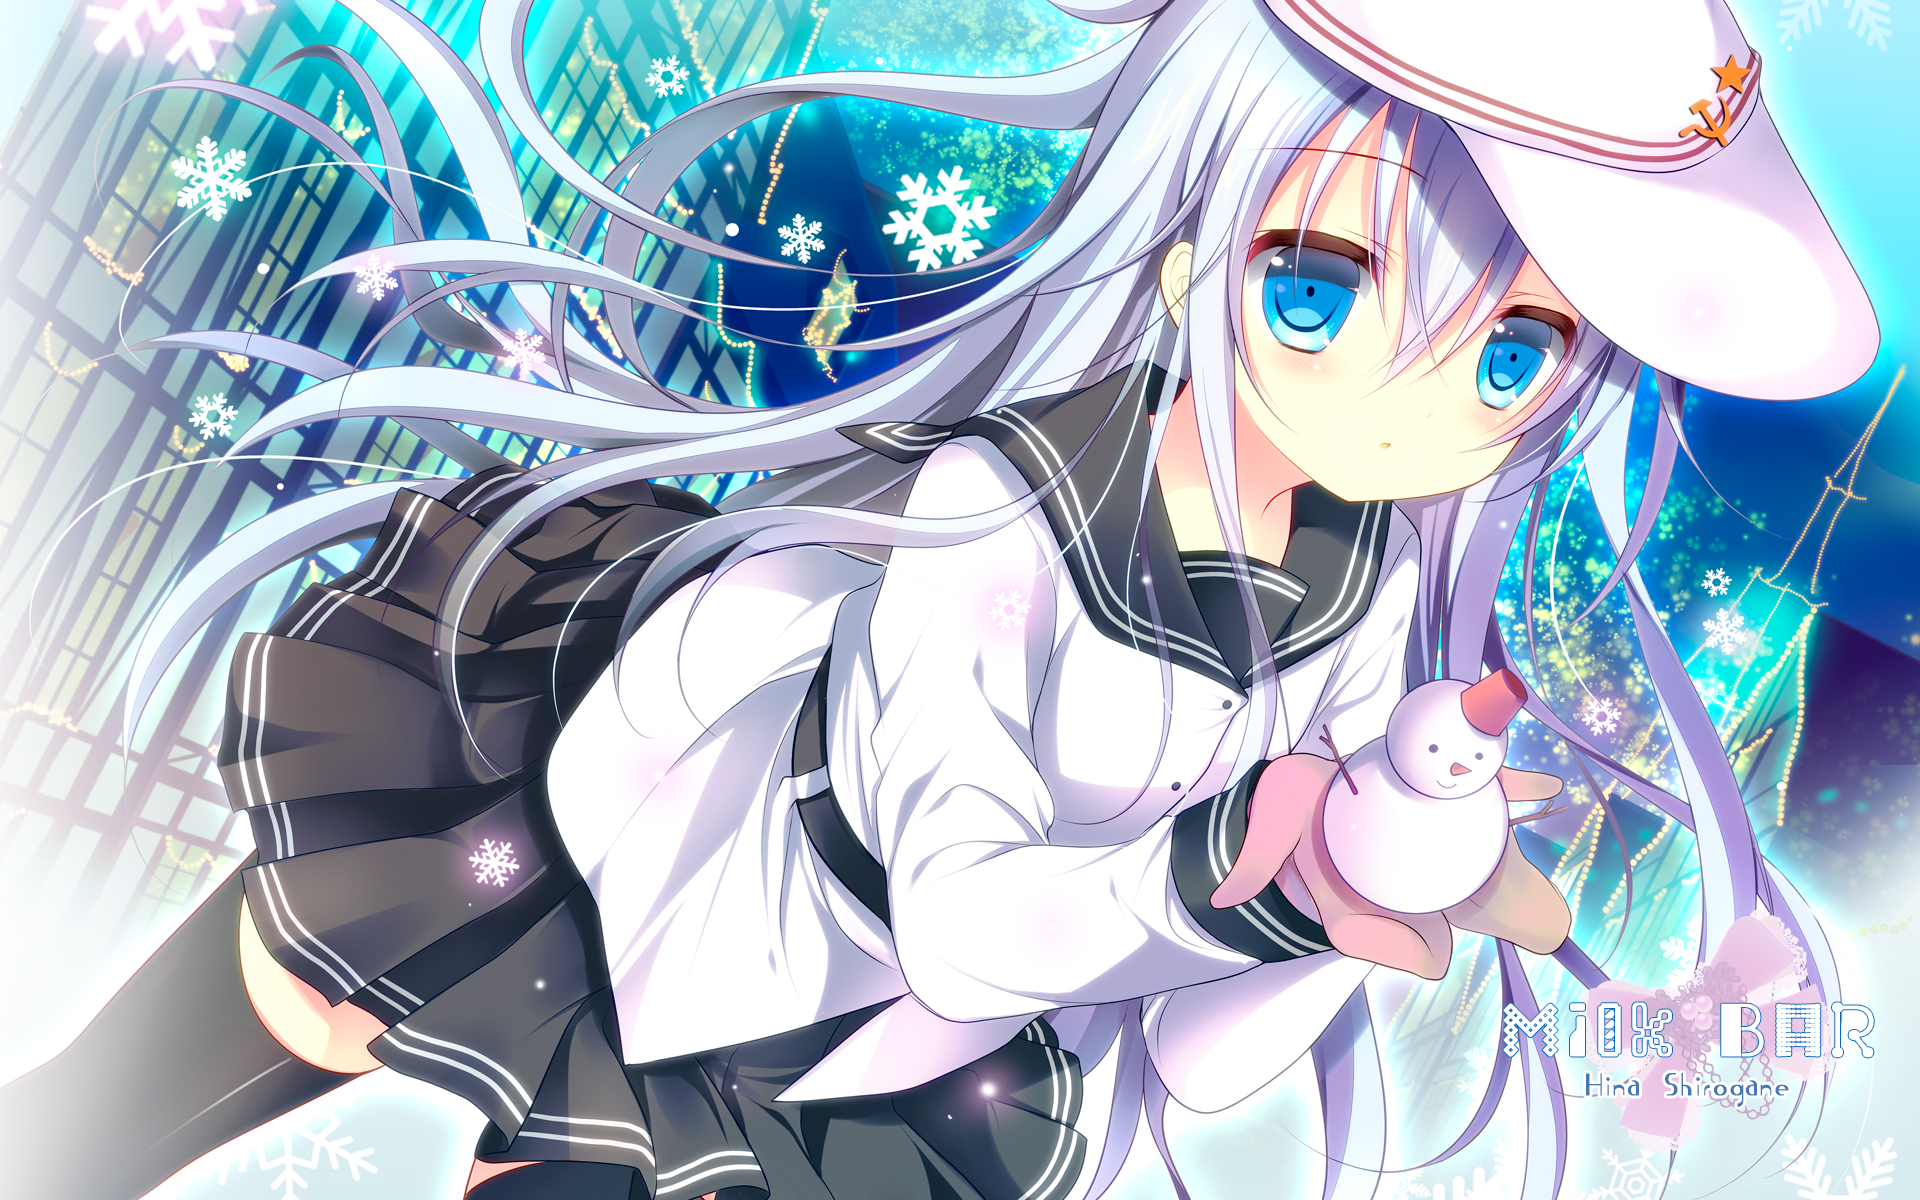 800 Wallpaper Abyss Anime Girl HD Terbaik